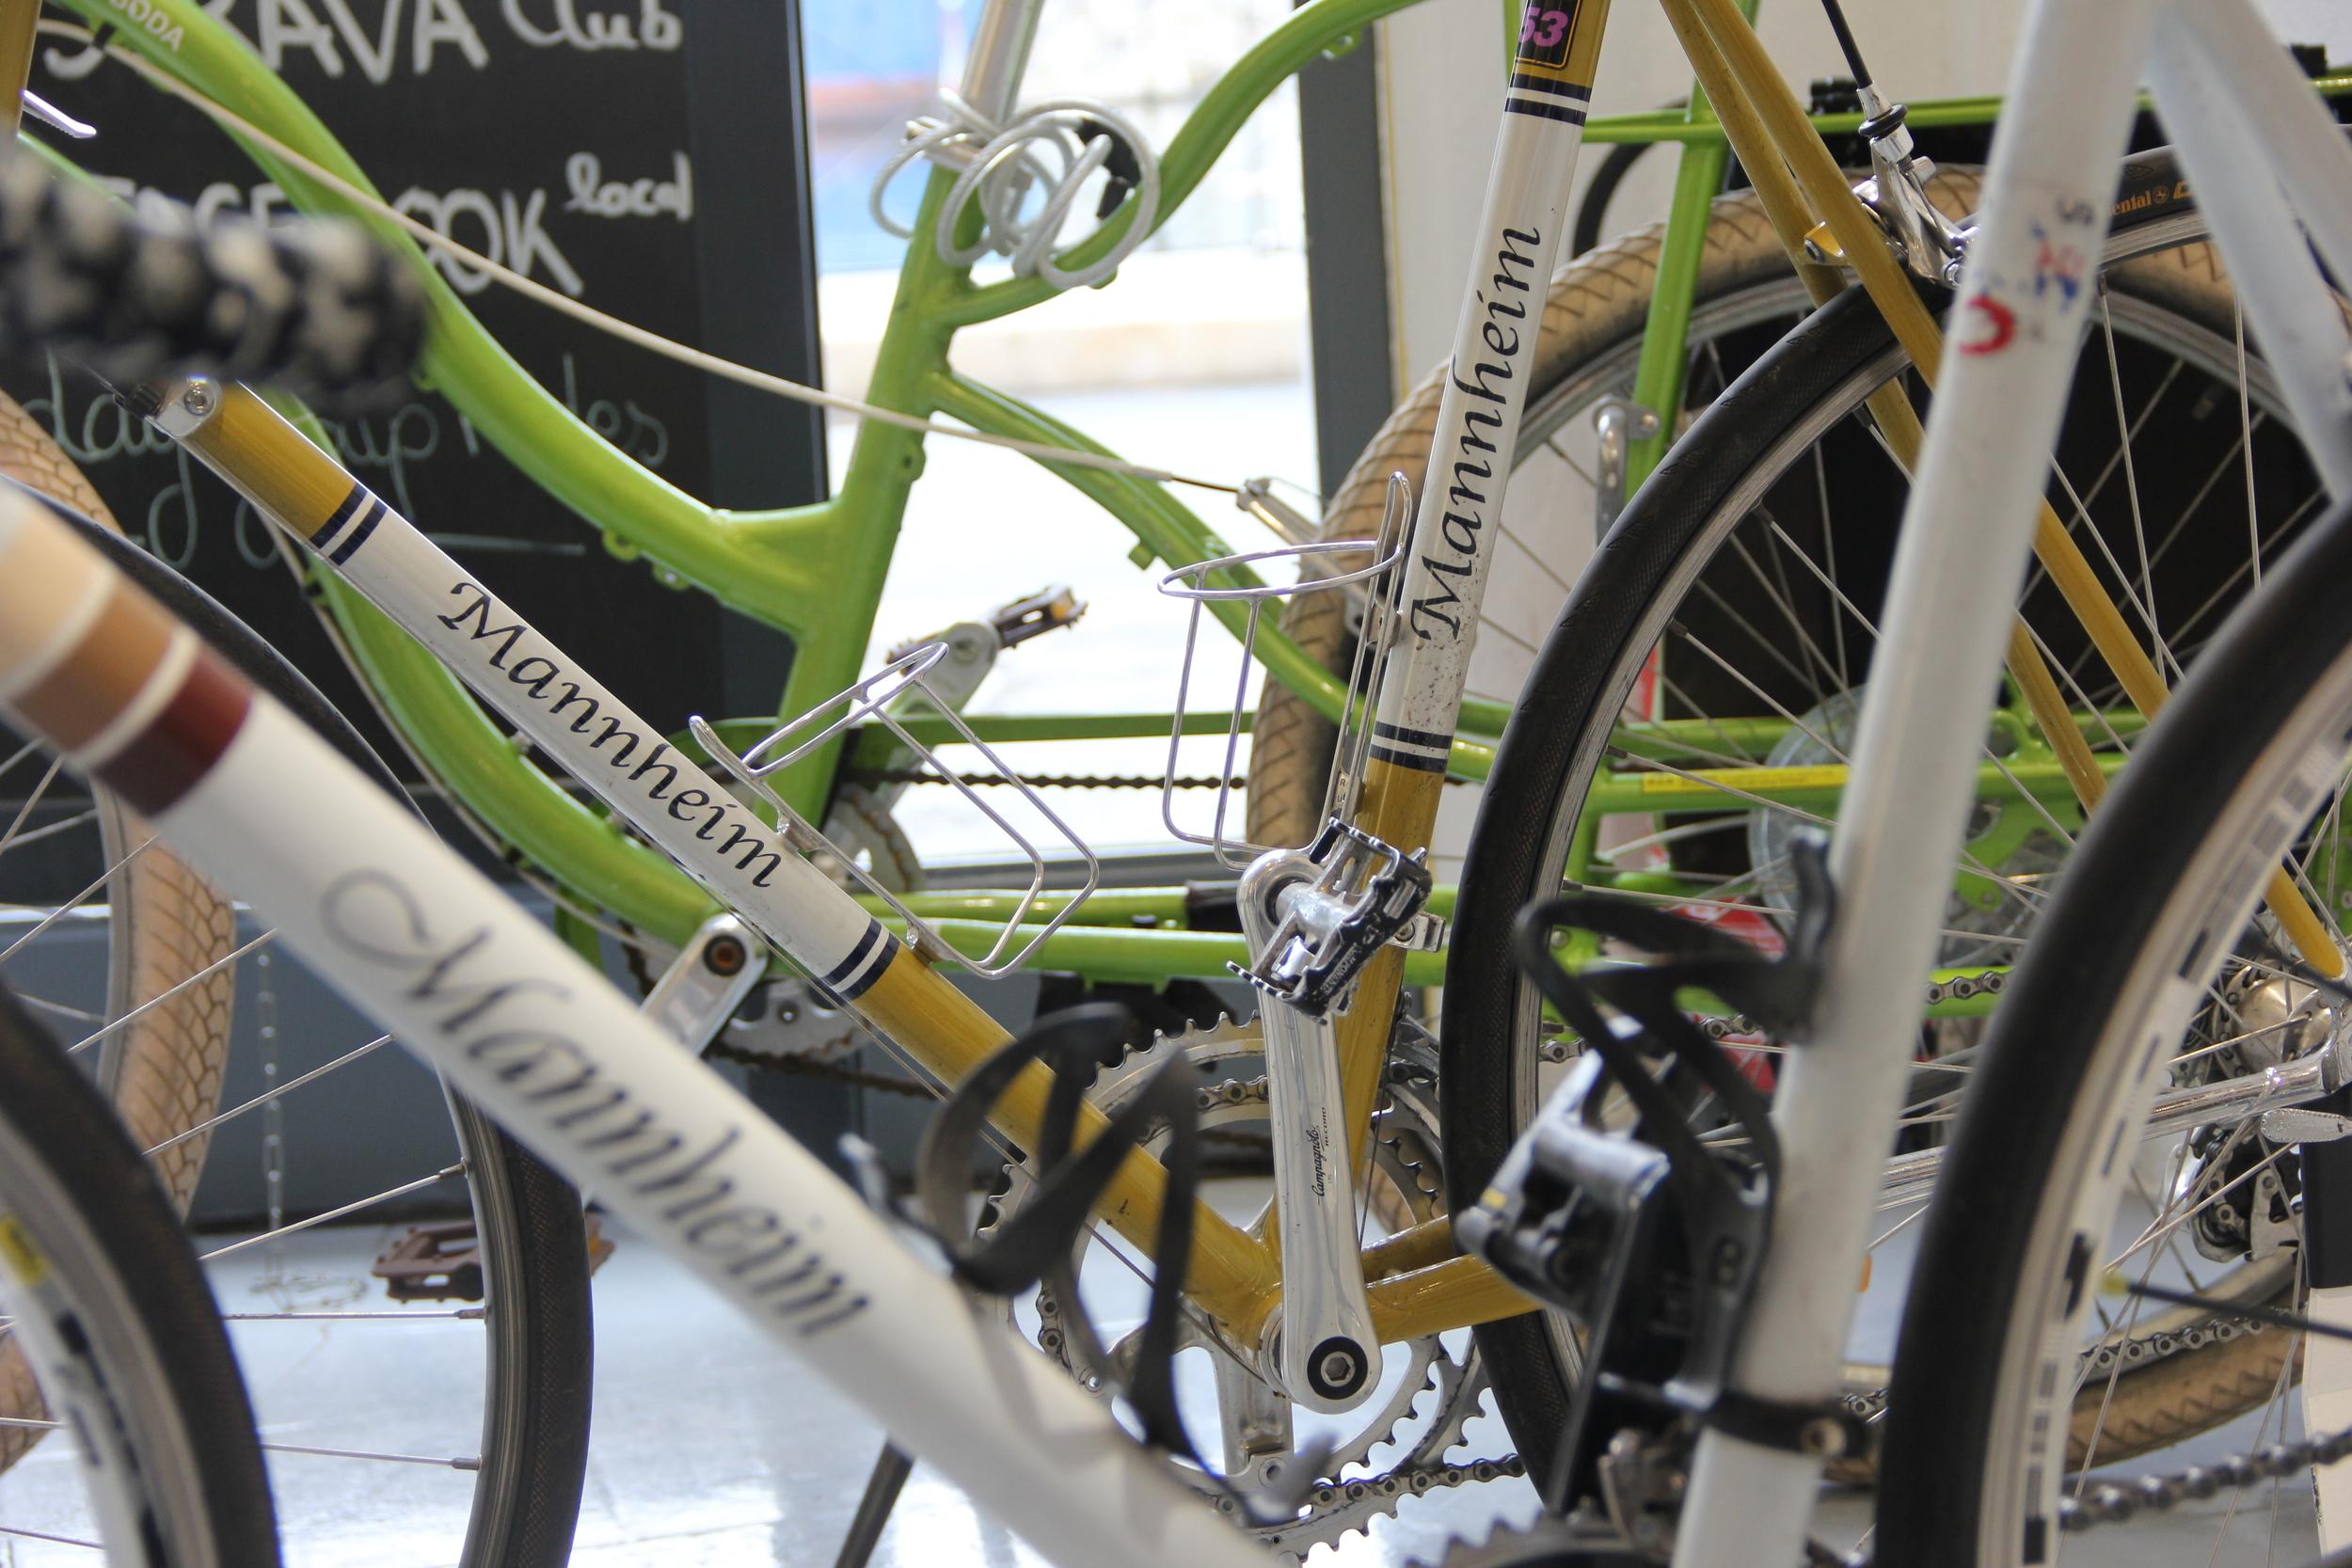 Rémi's personal bike collection